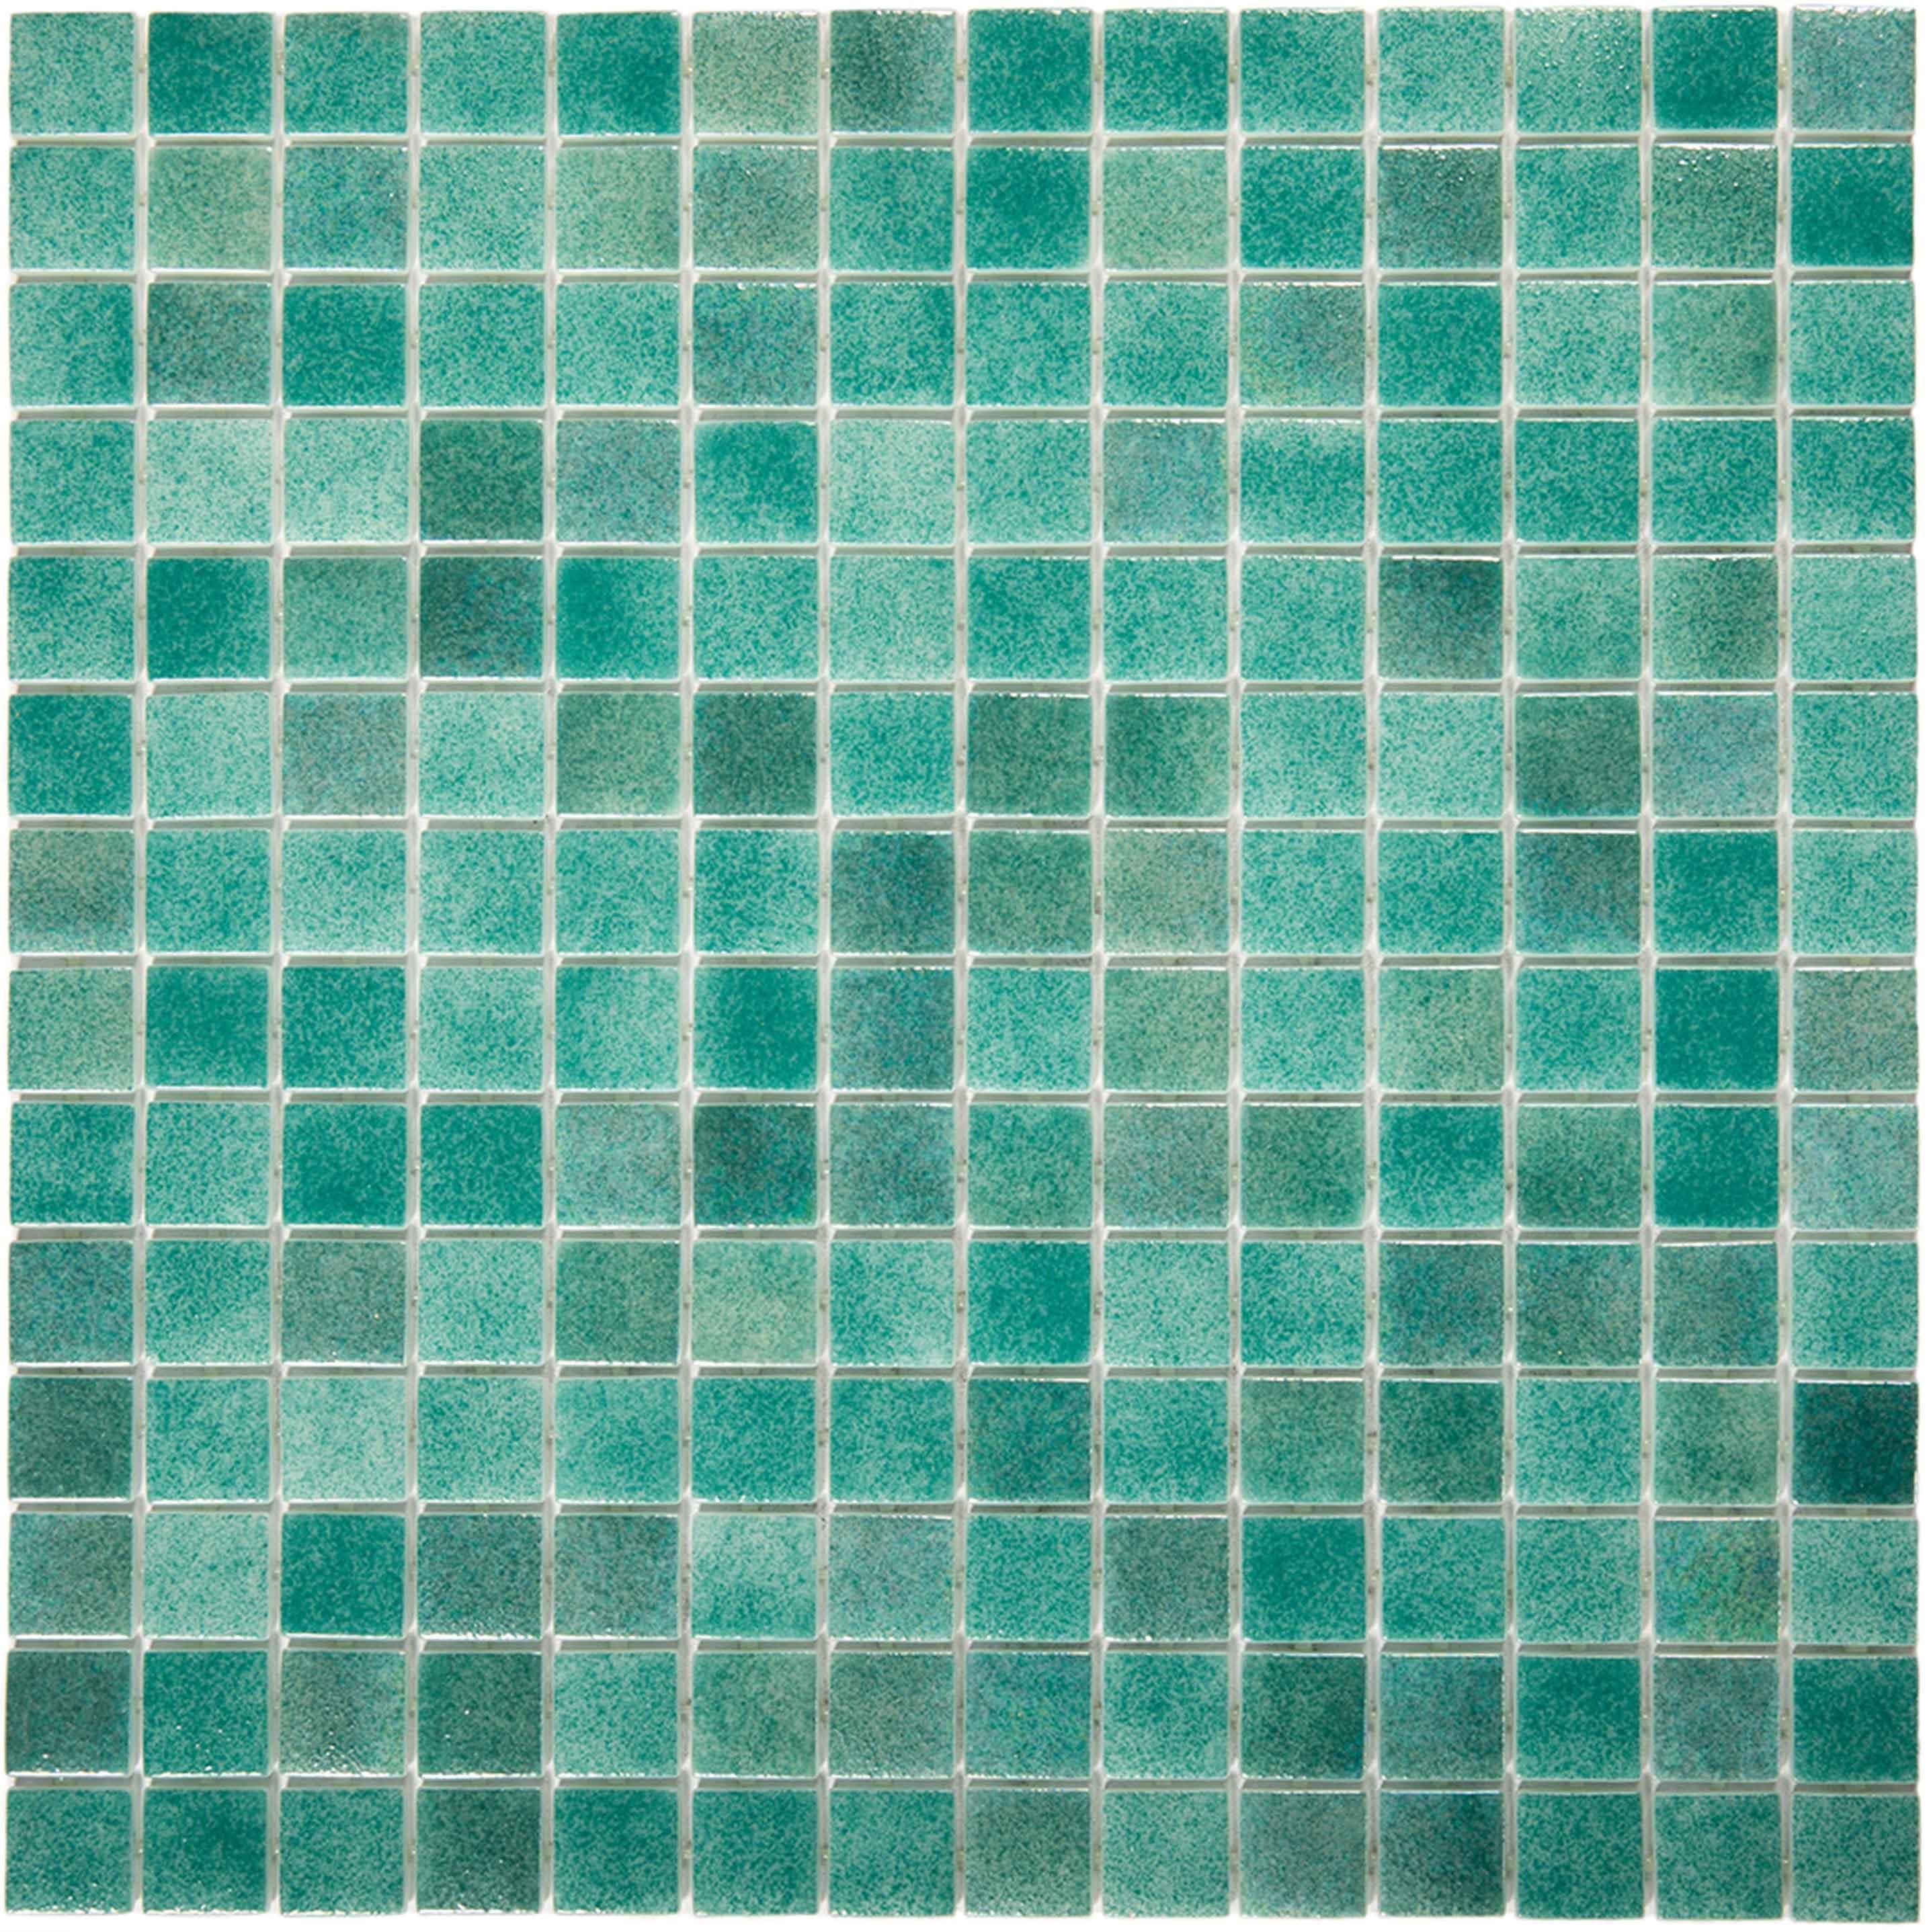 Pool-Tiles Hero Hisbalit Lagoon-hero-gallery-2